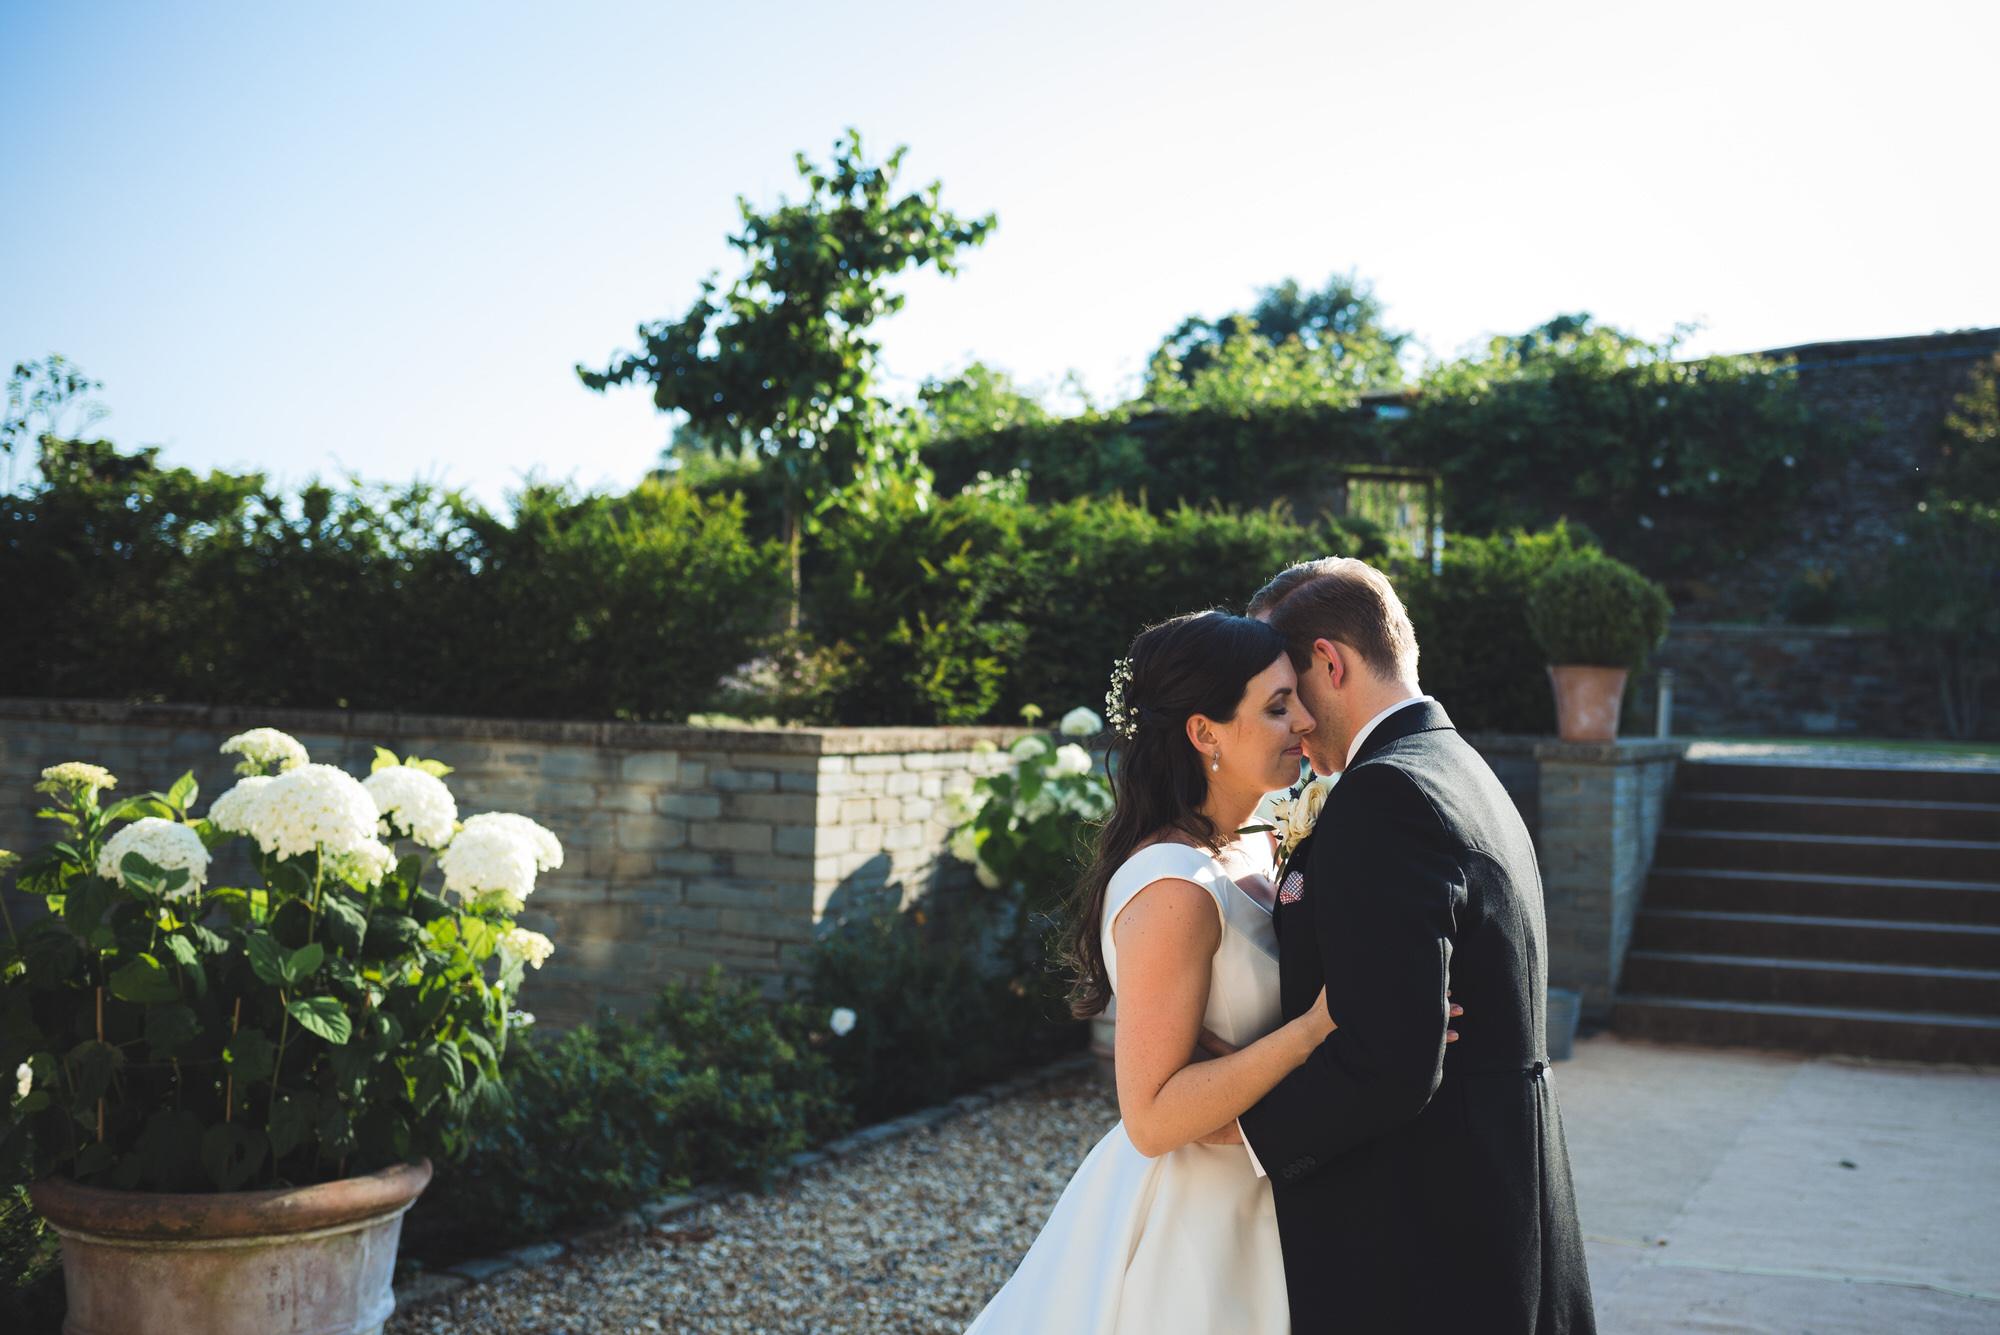 Shilstone wedding photographer 31